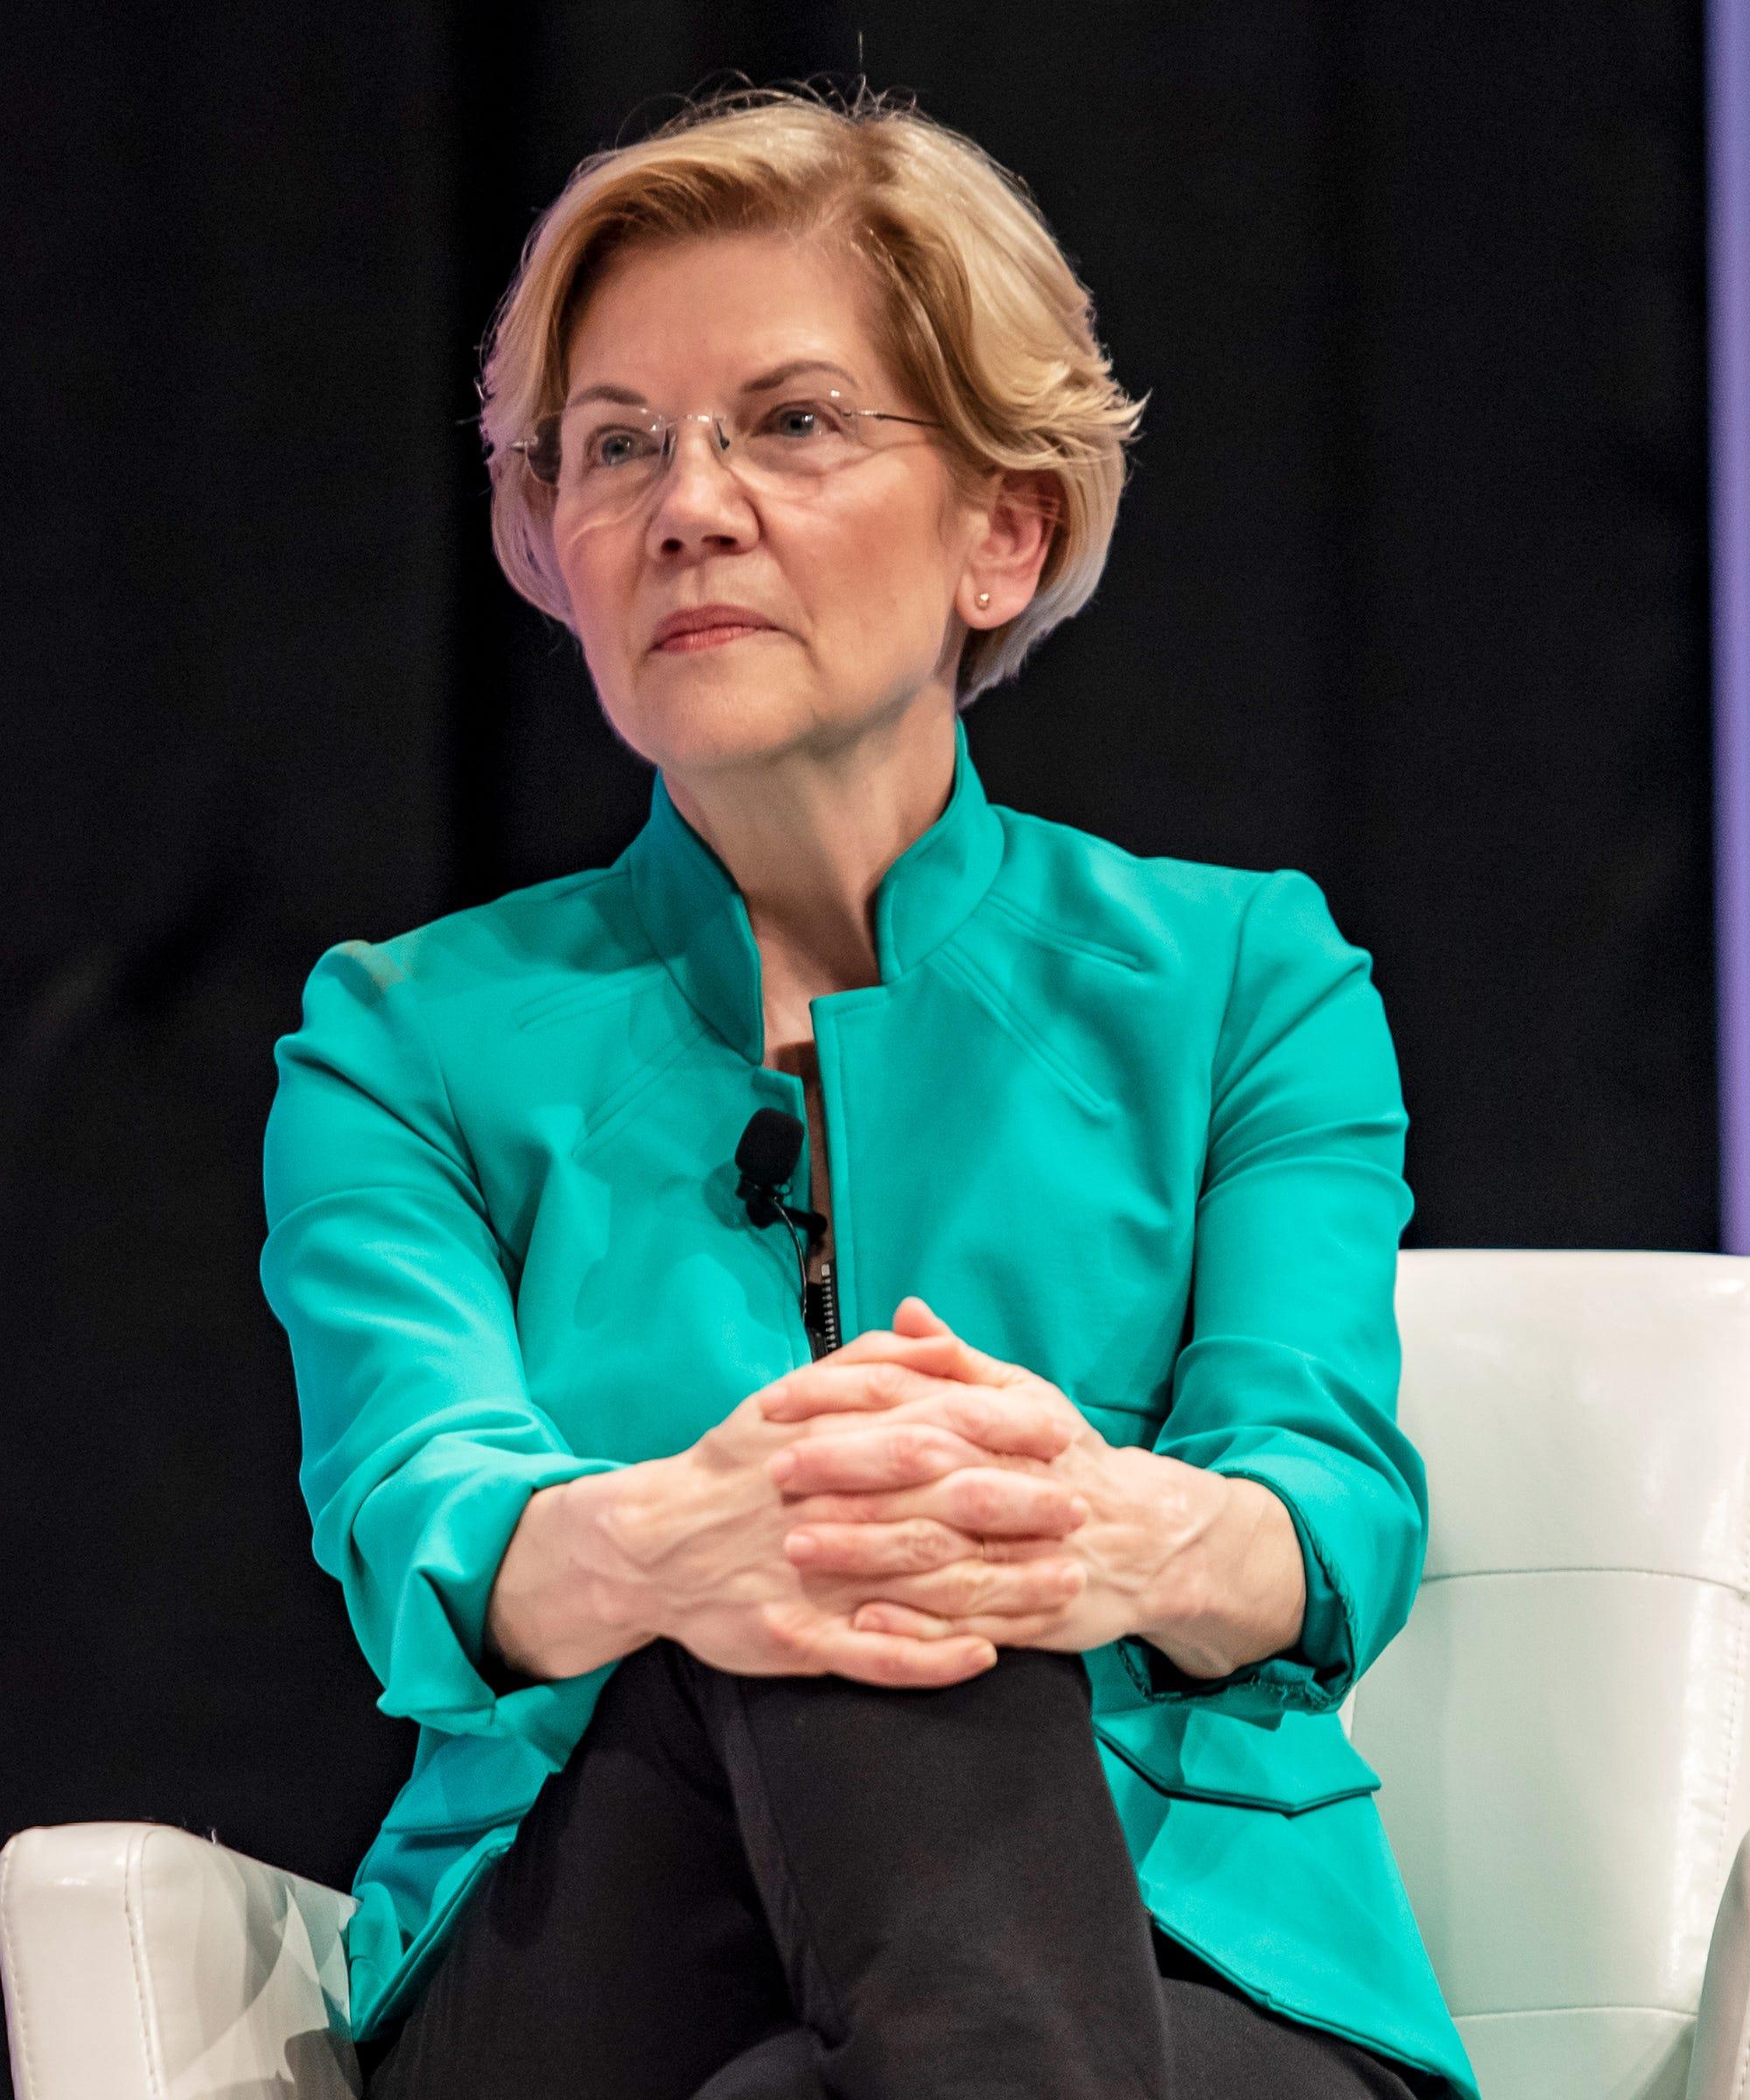 Elizabeth Warren Has A Plan To Keep Black Women From Dying In Childbirth